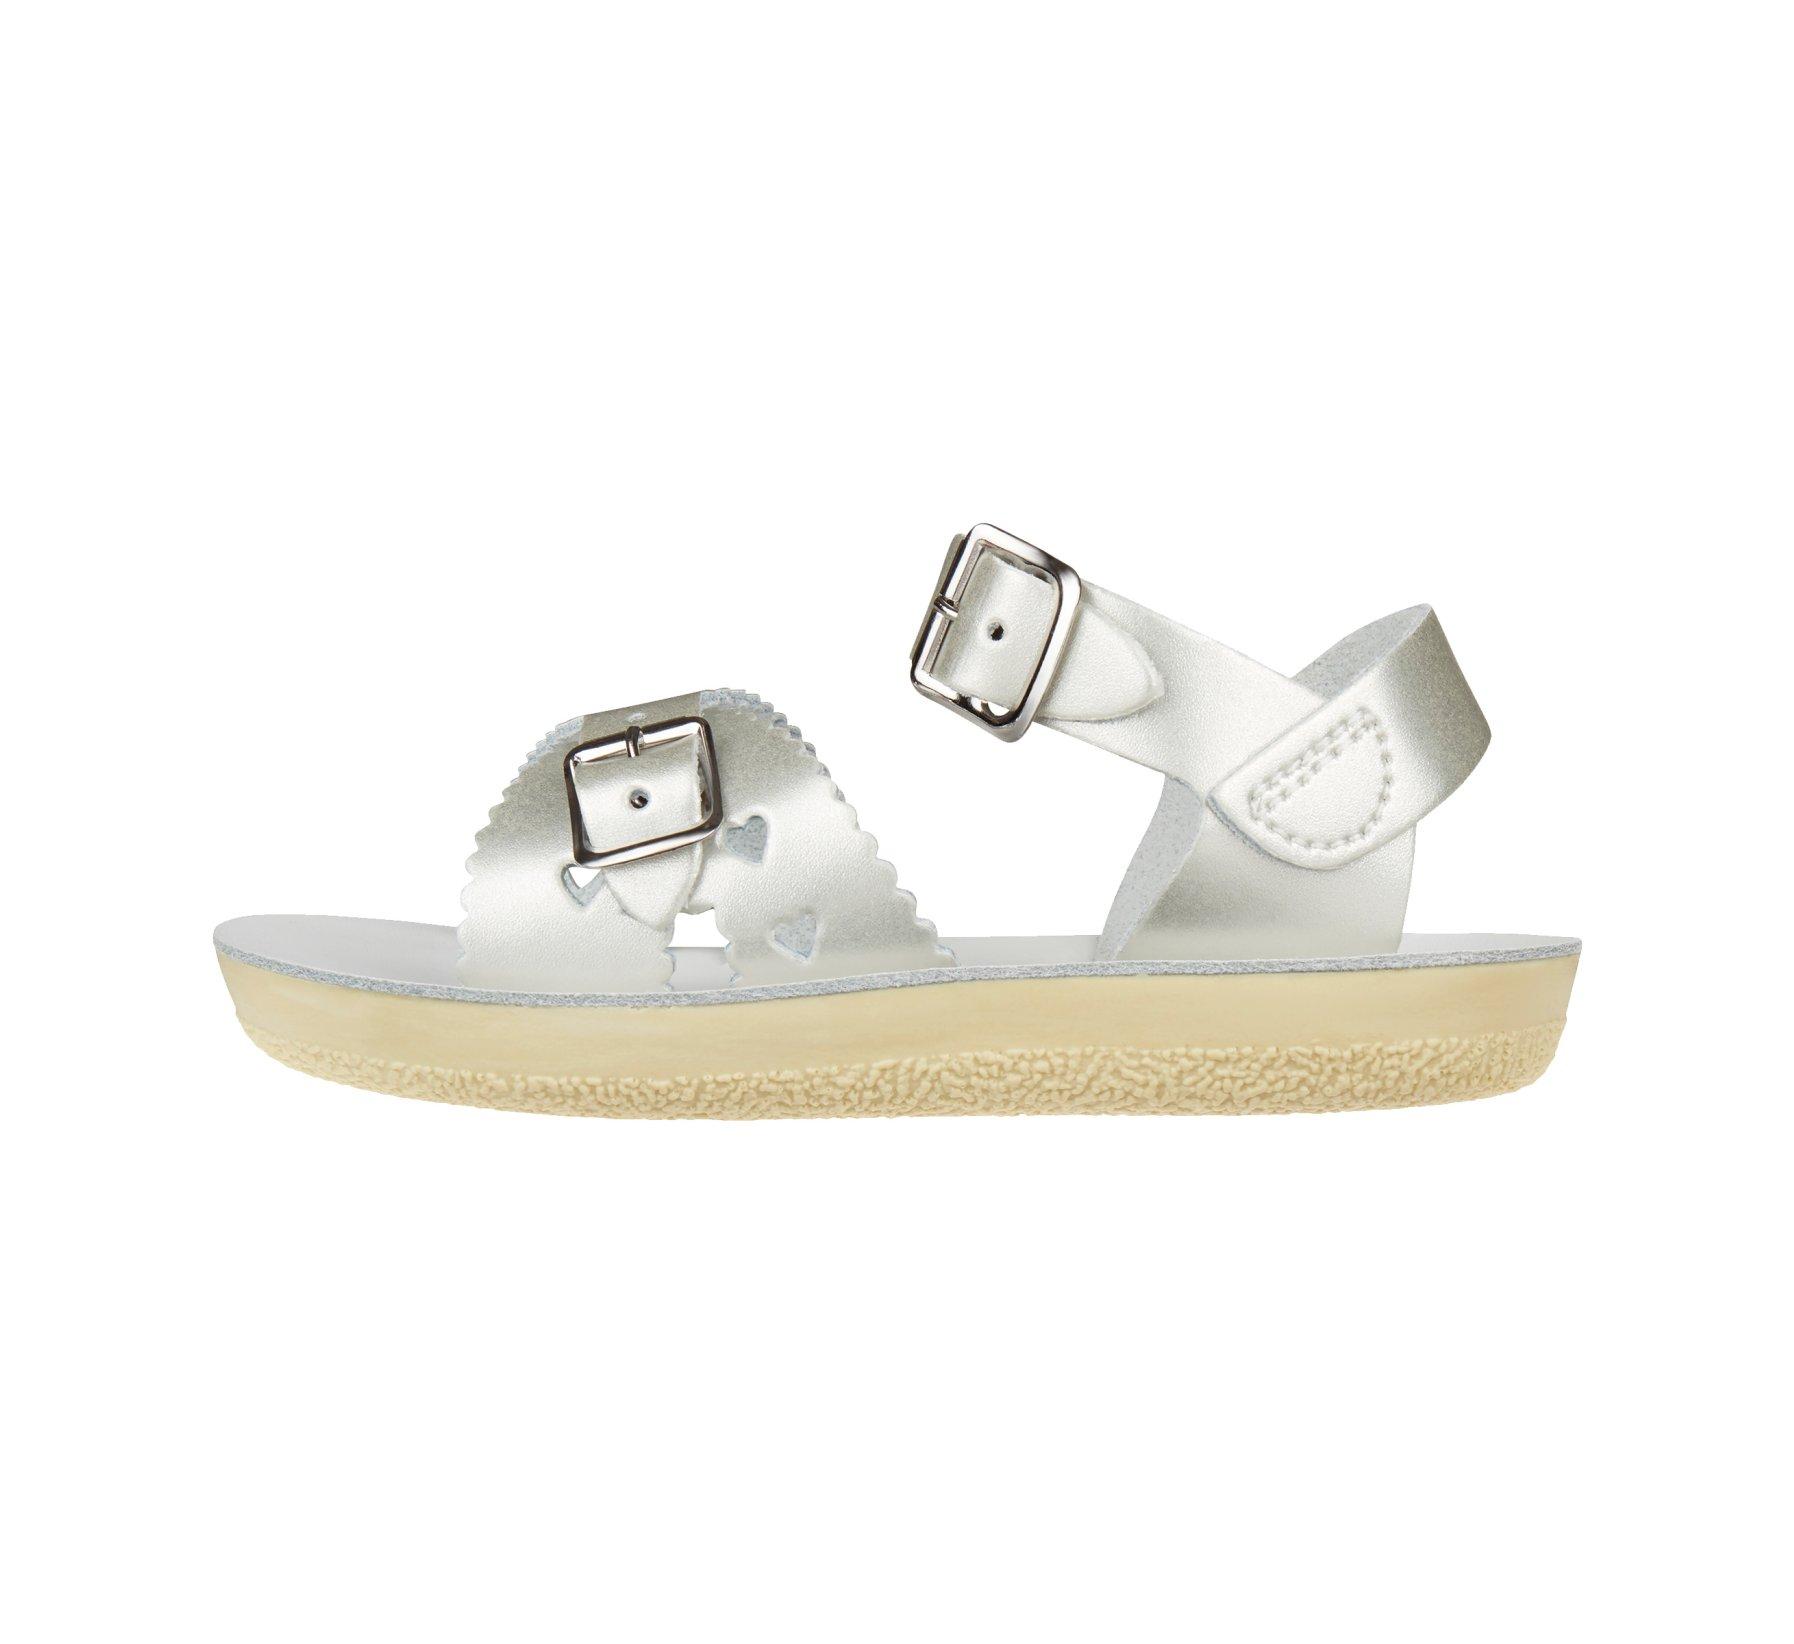 Sweetheart Silver - Salt Water Sandals